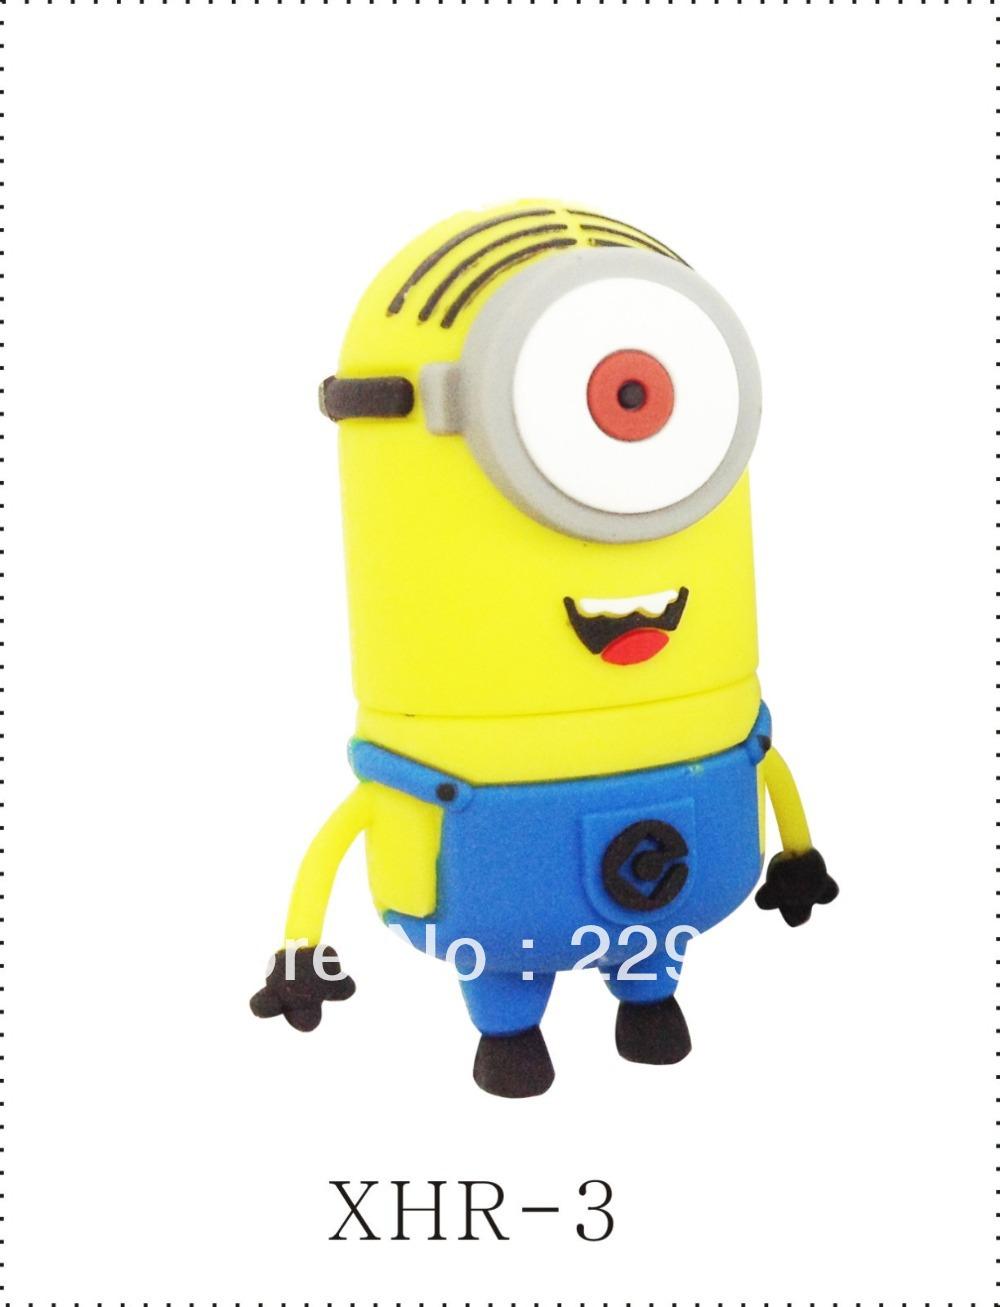 Sorriso minons flash usb, o projeto original, nova cartoon flash drive usb, memória usb flash drive caneta vara polegar bonito, frete grátis